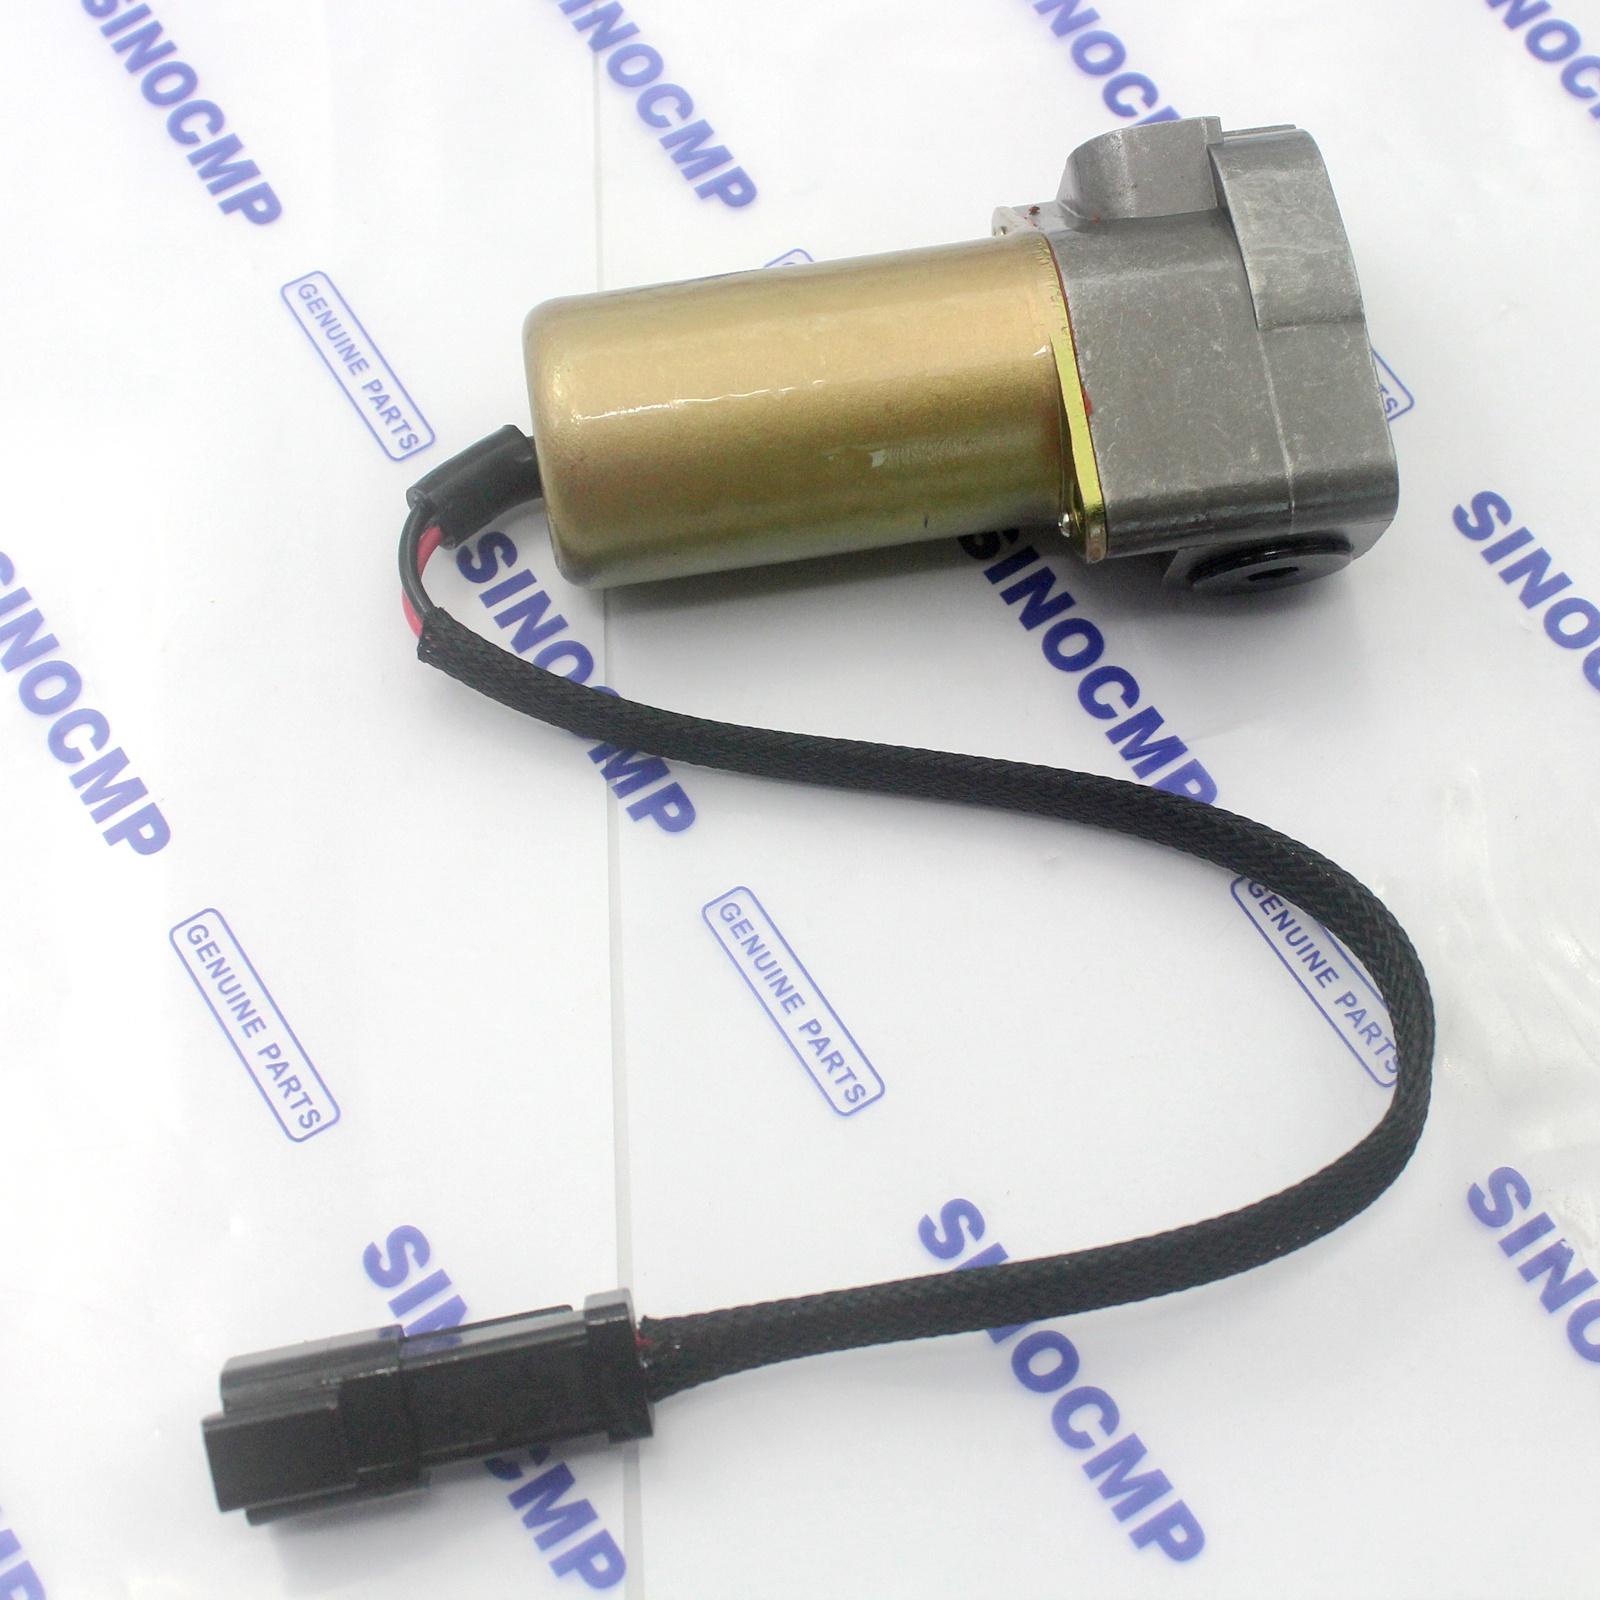 Solenoid Valve Ass/'y 702-21-07610 For Komatsu PC130-8 PC300-8 PC400-8 Excavator